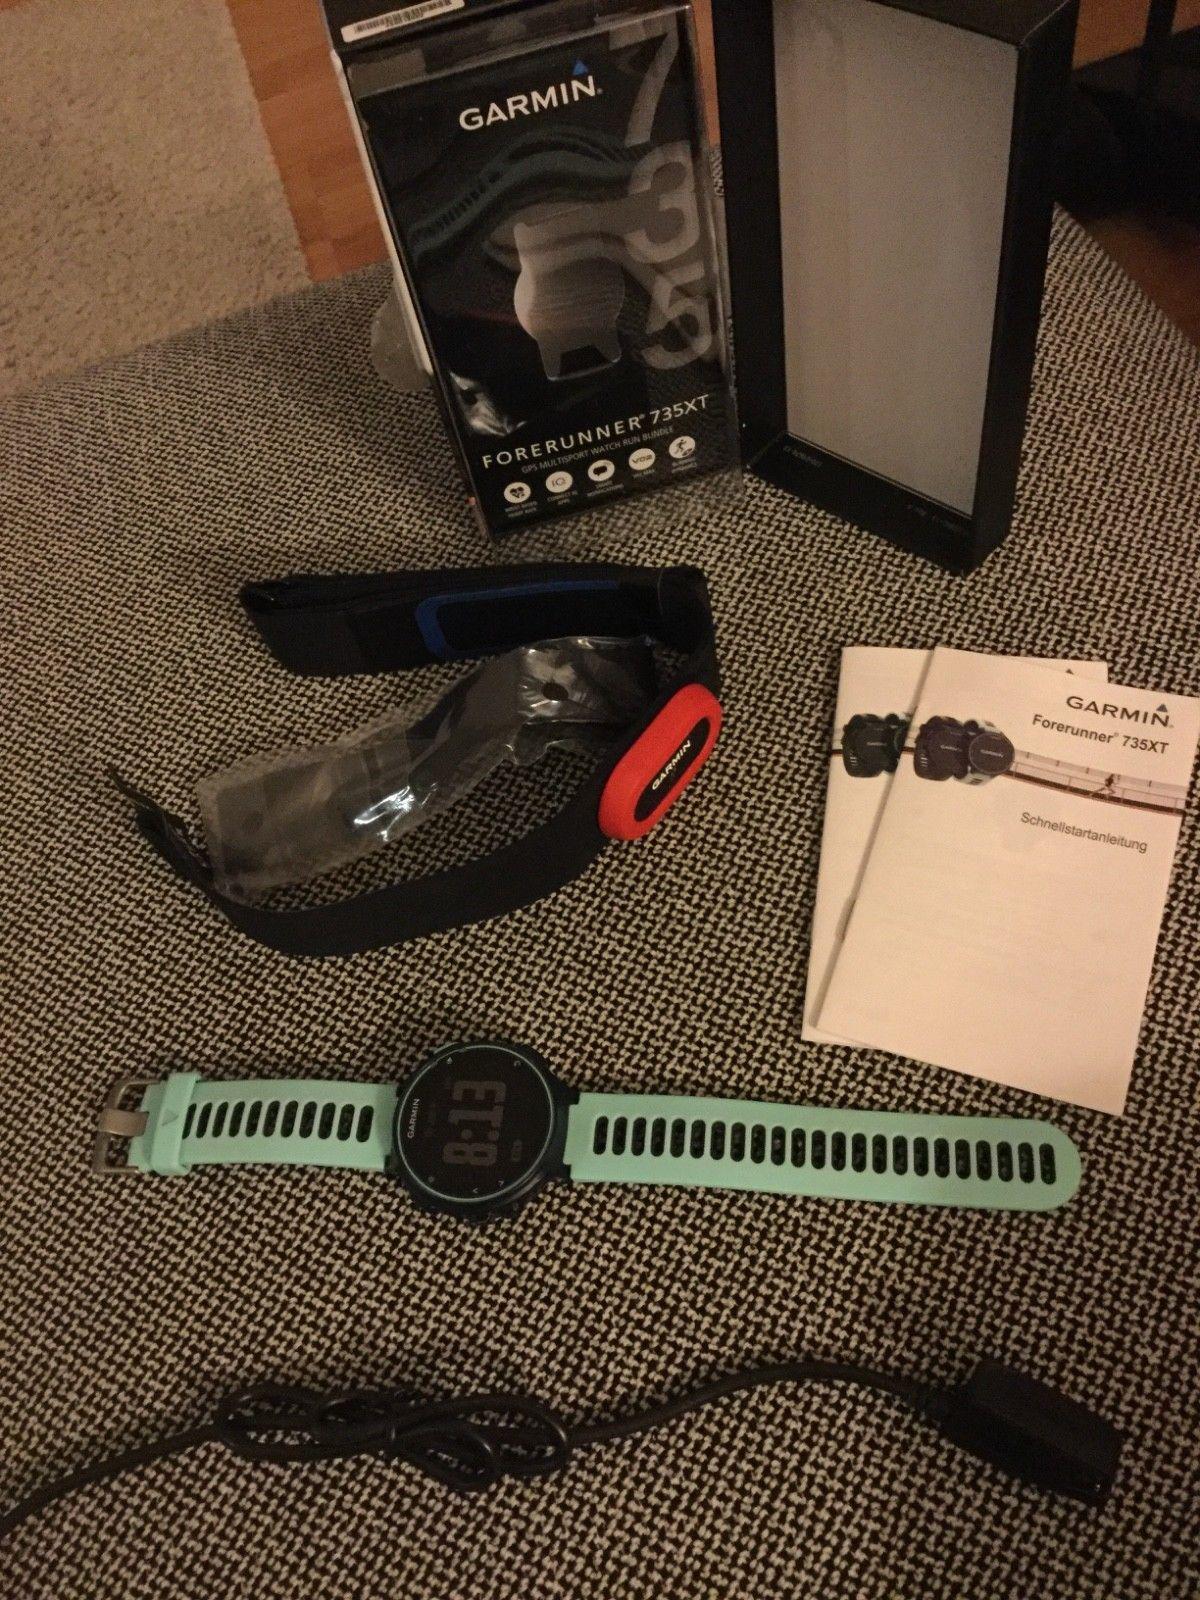 Garmin Forerunner 735xt Frost Blau Multisport Herzfrequenzmessung GPS NEU OVP